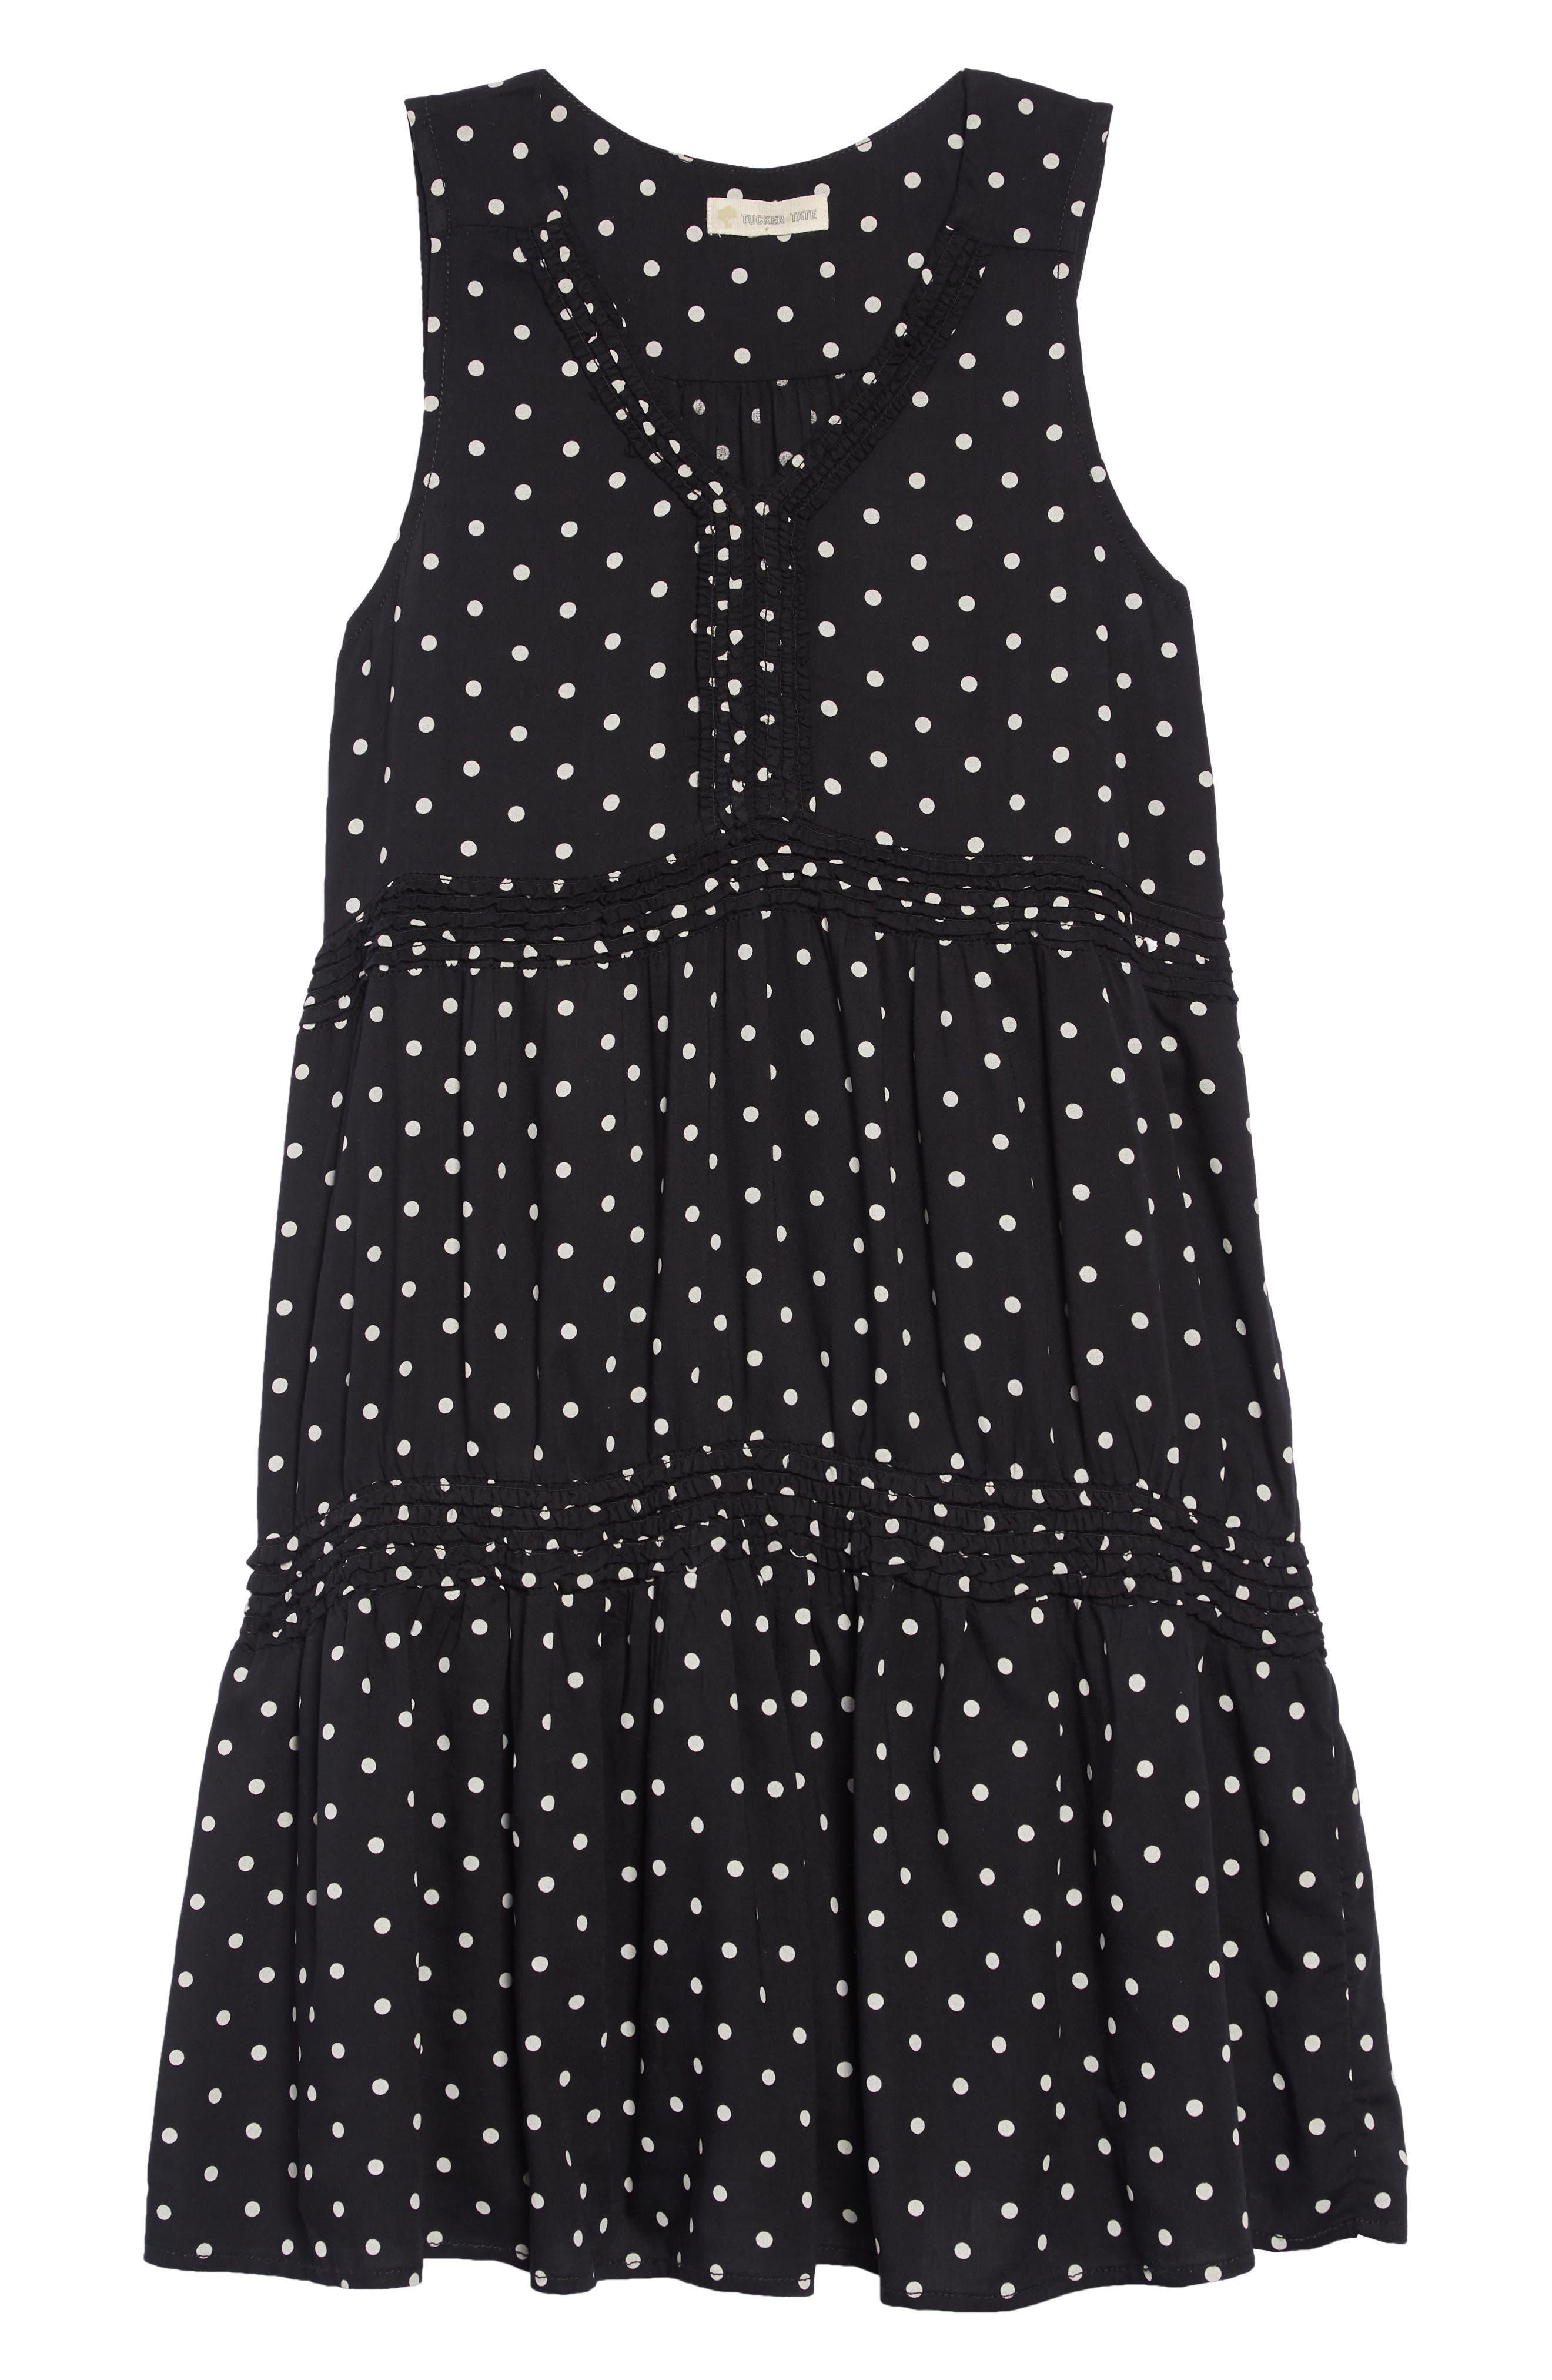 Tiered Print Dress,                         Main,                         color, BLACK- WHITE DOT